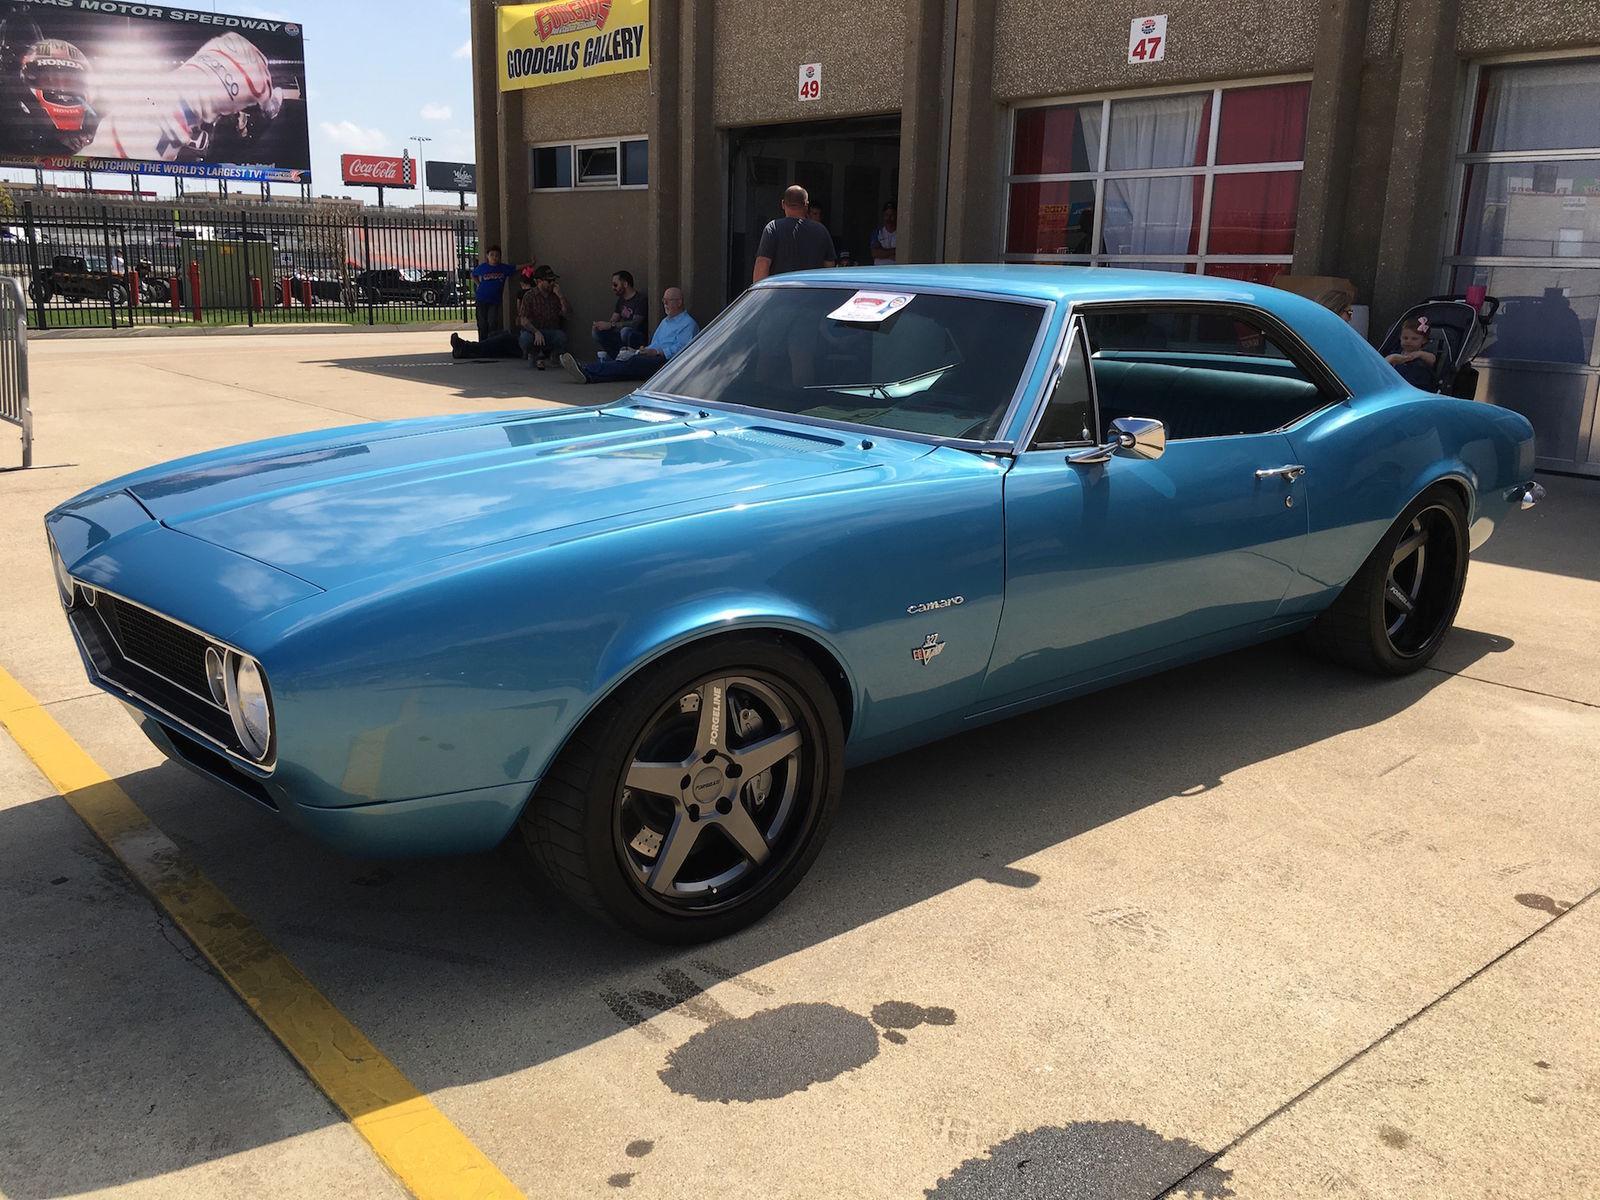 1967 Chevrolet Camaro | Jason's '67 Camaro on Forgeline CF3C Wheels Earns Goodguys Best Ride on BFGs Award